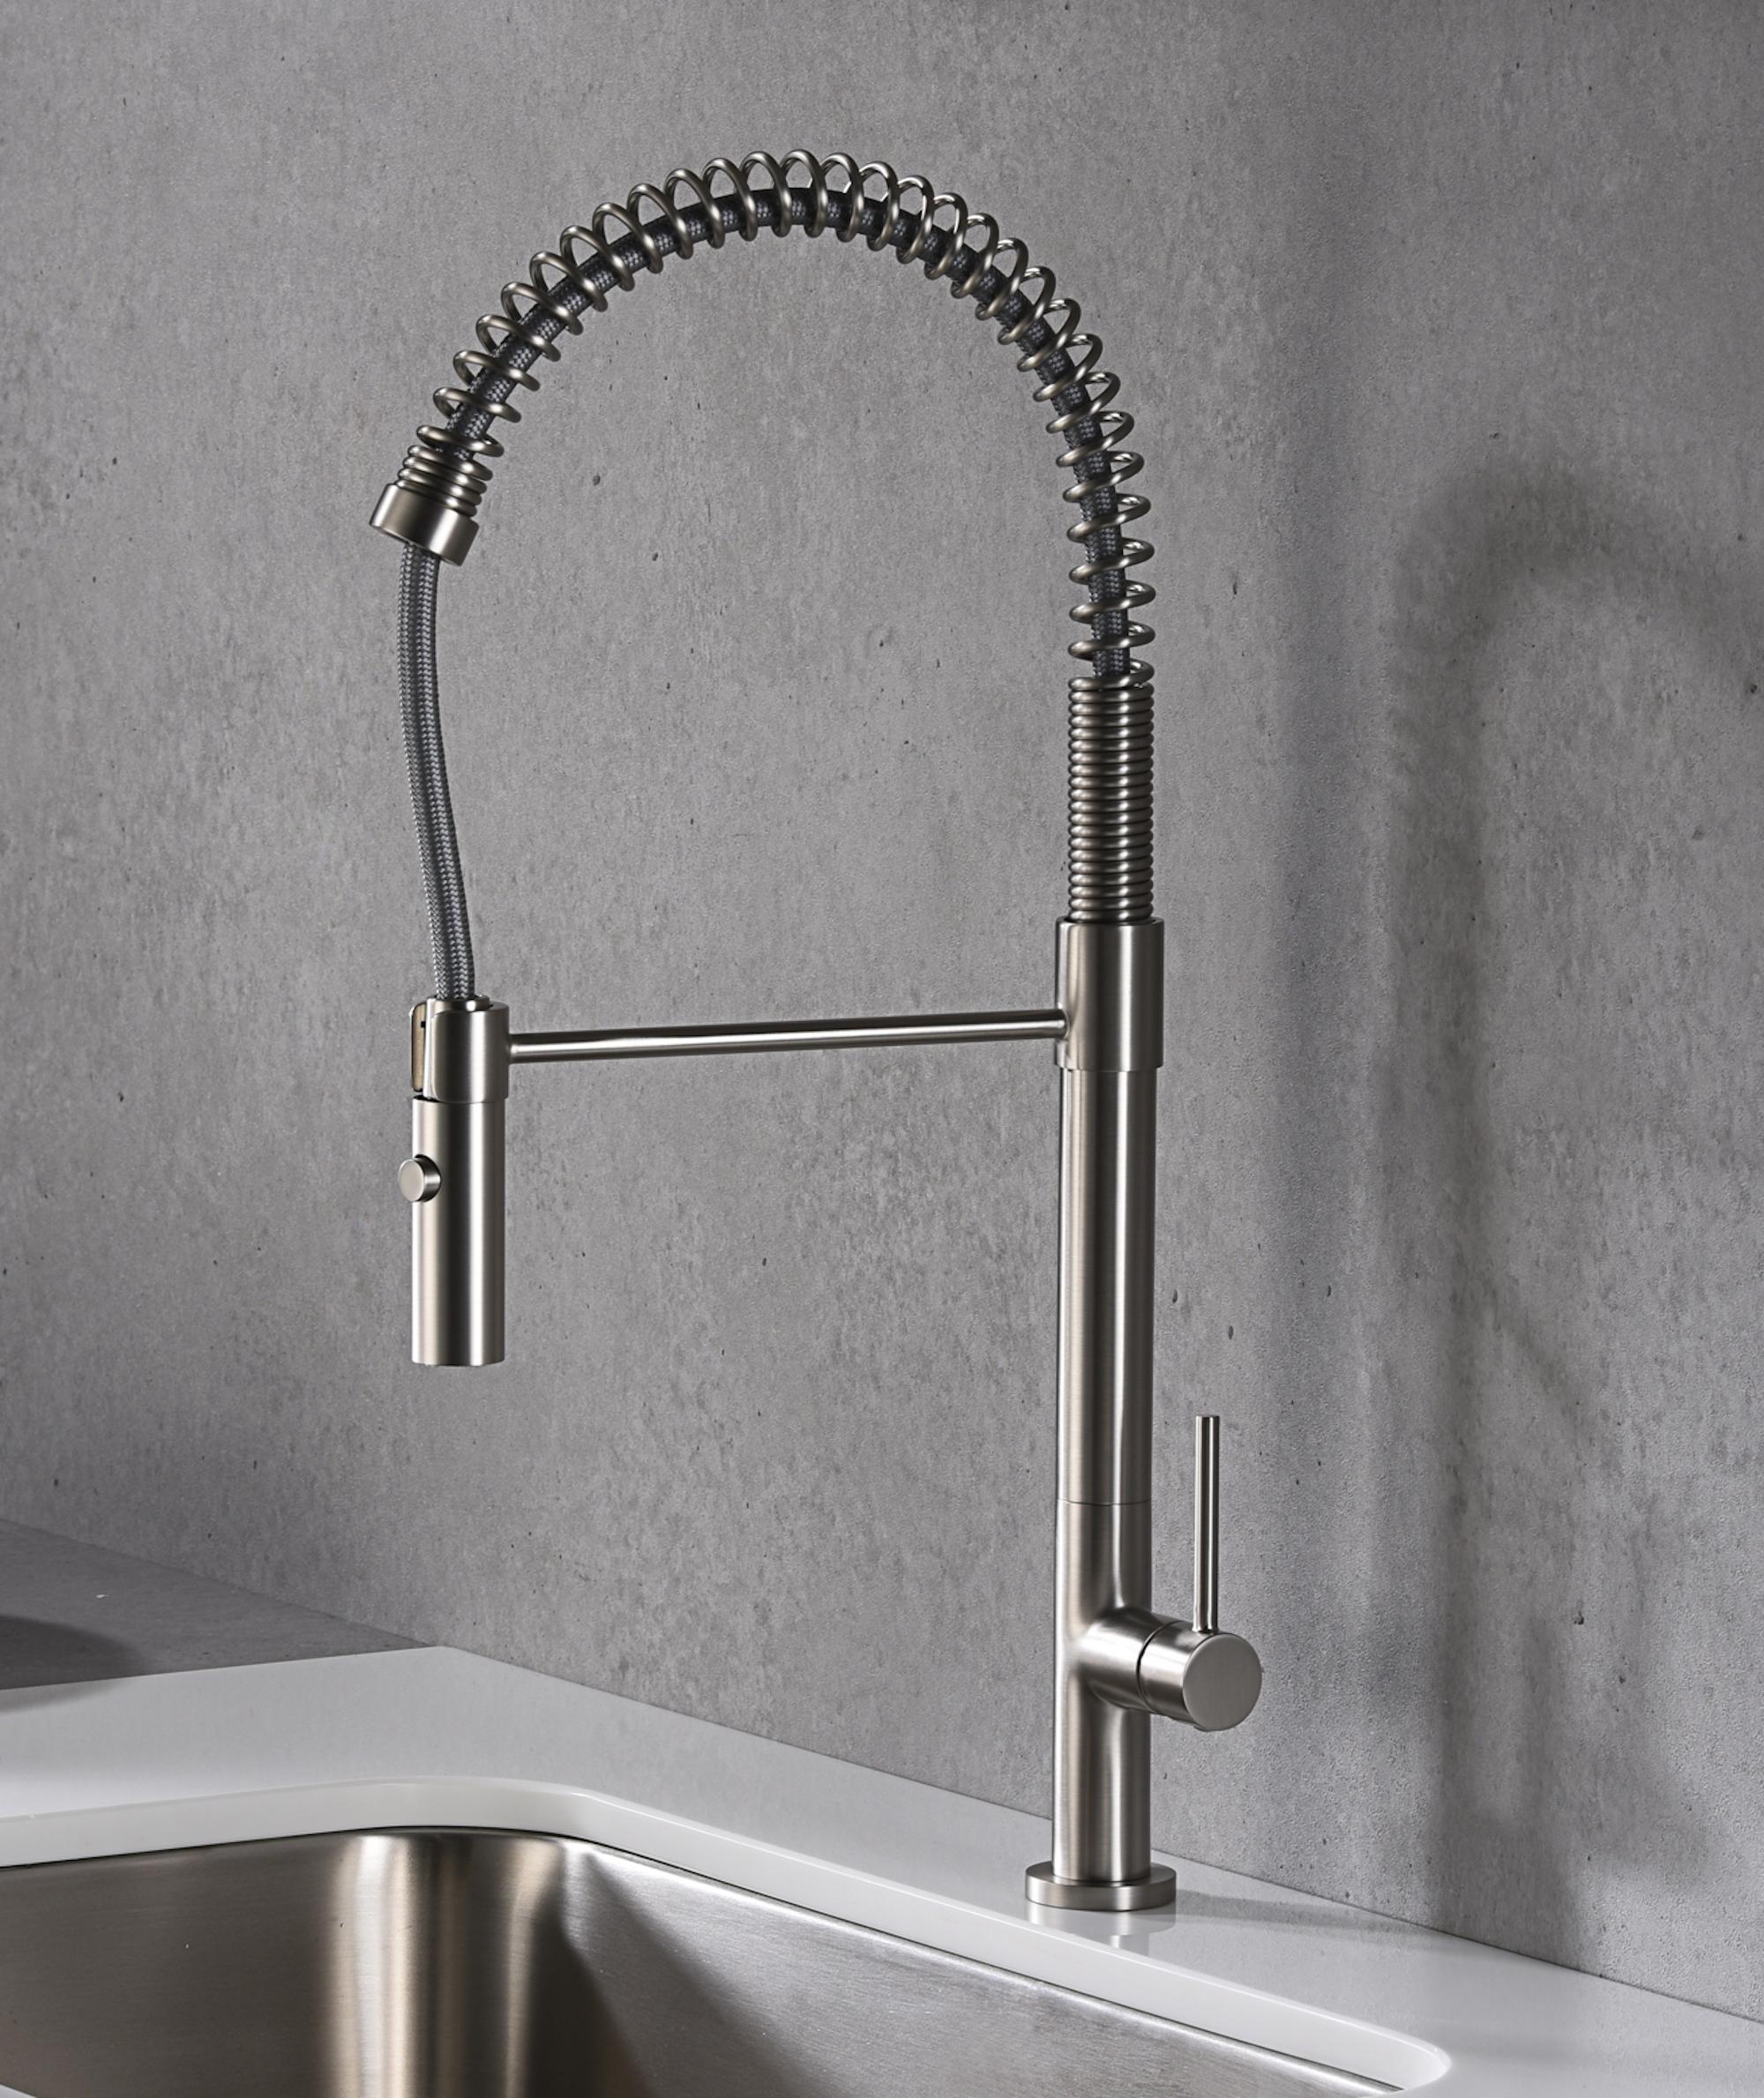 Karran Bluffton Single Lever Handle Lead-free Brass ADA Kitchen Faucet, Pull Down, Stainless Steel, KKF220SS